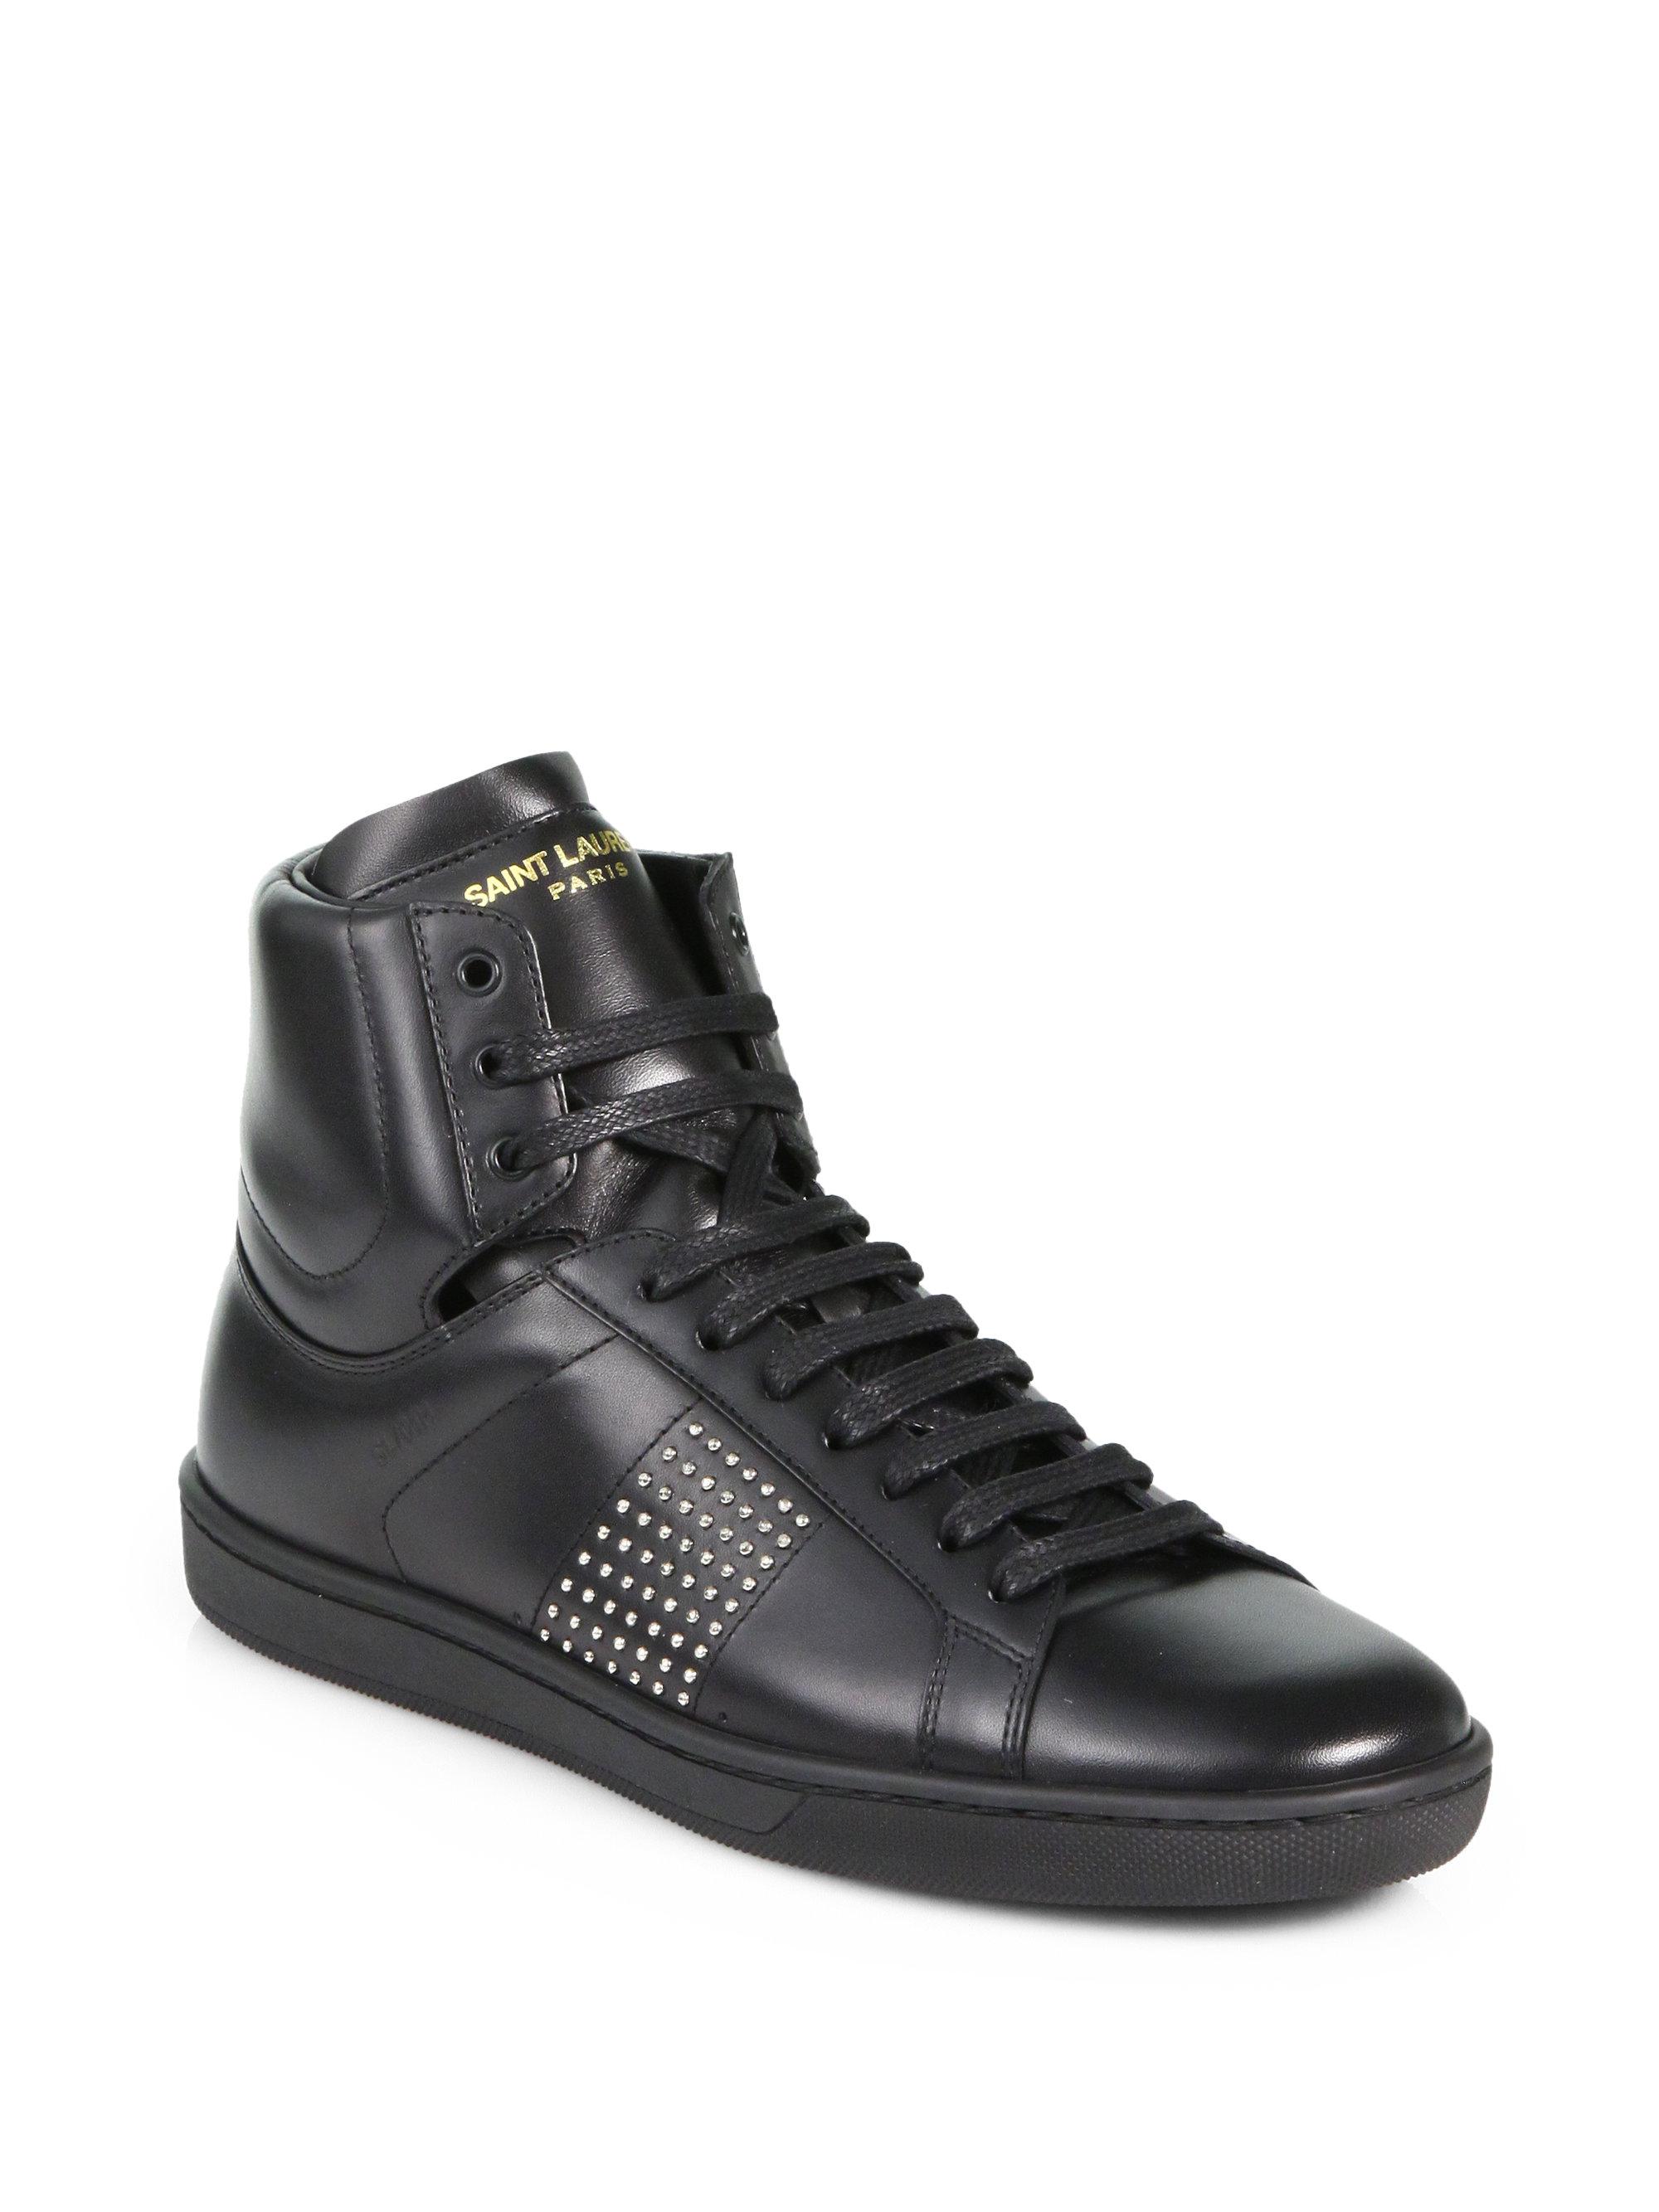 saint laurent studded leather hightop sneakers in black lyst. Black Bedroom Furniture Sets. Home Design Ideas